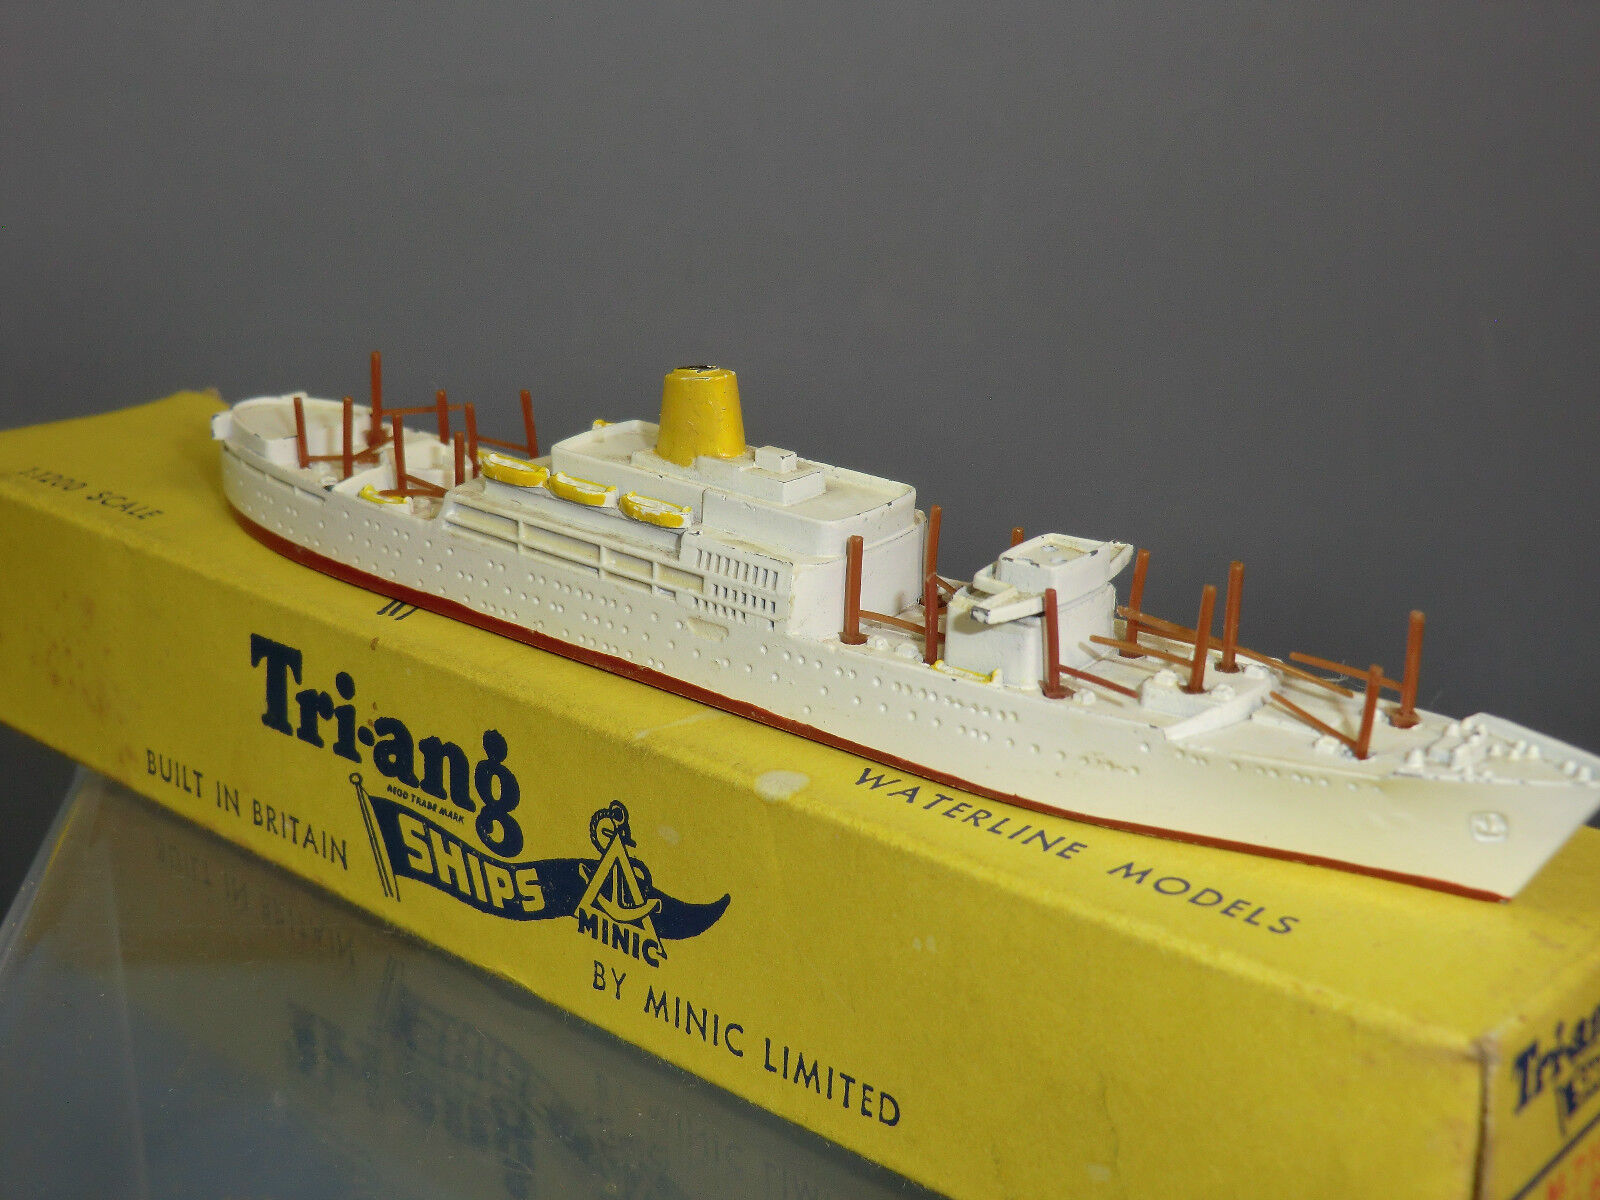 Triang Minic Ships Modelo No.M718 RMS  Amazon  VN MIB